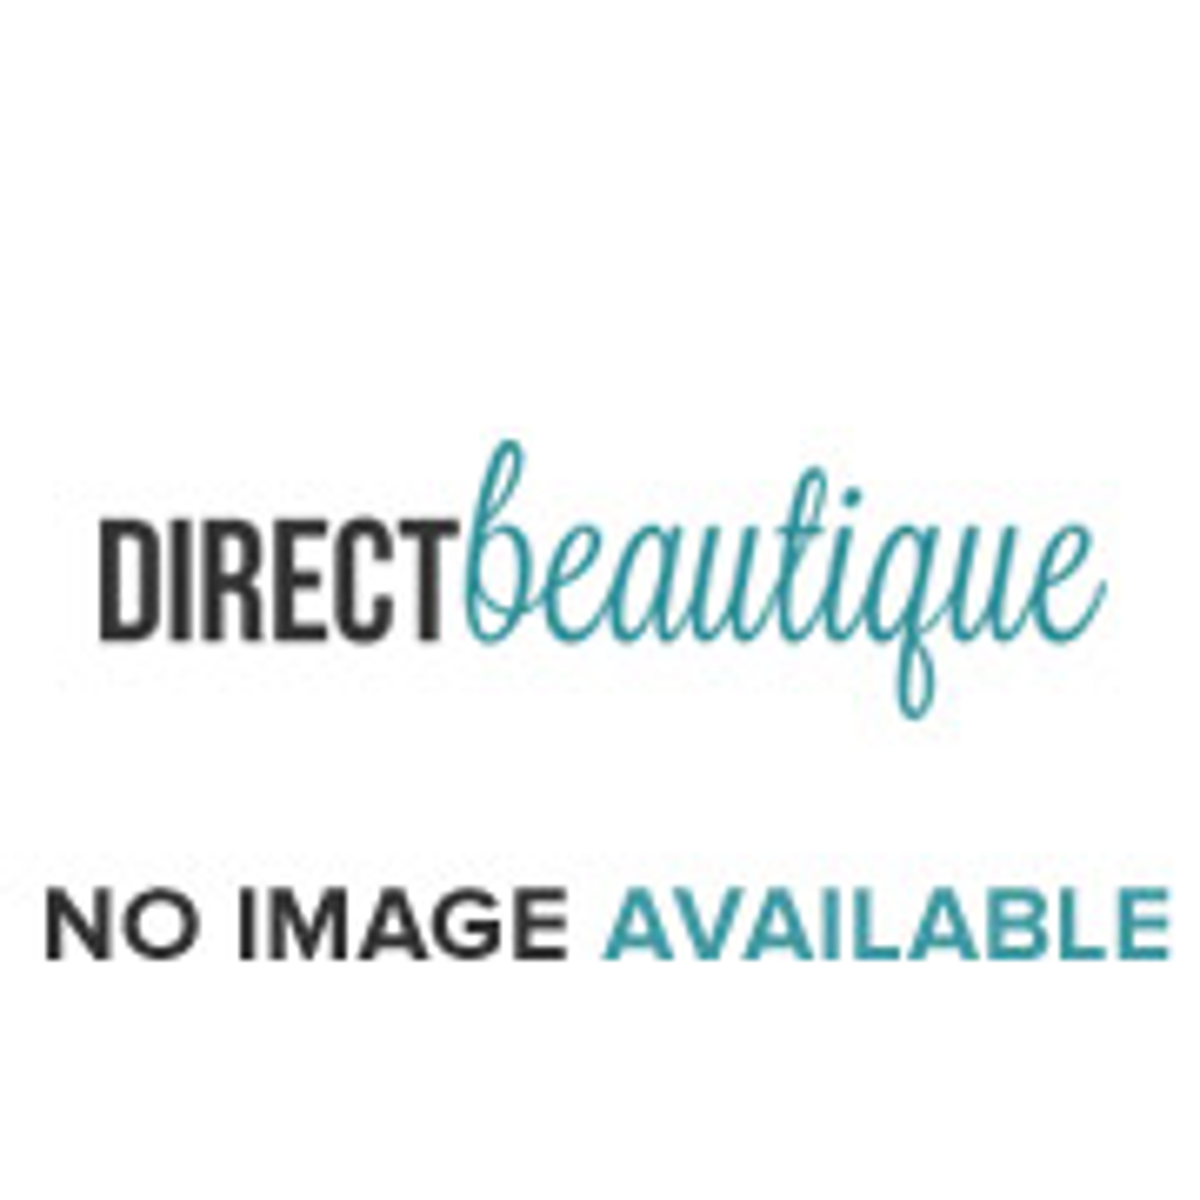 Gianfranco Ferre Ferre Rose Princesse 50ml EDT Spray